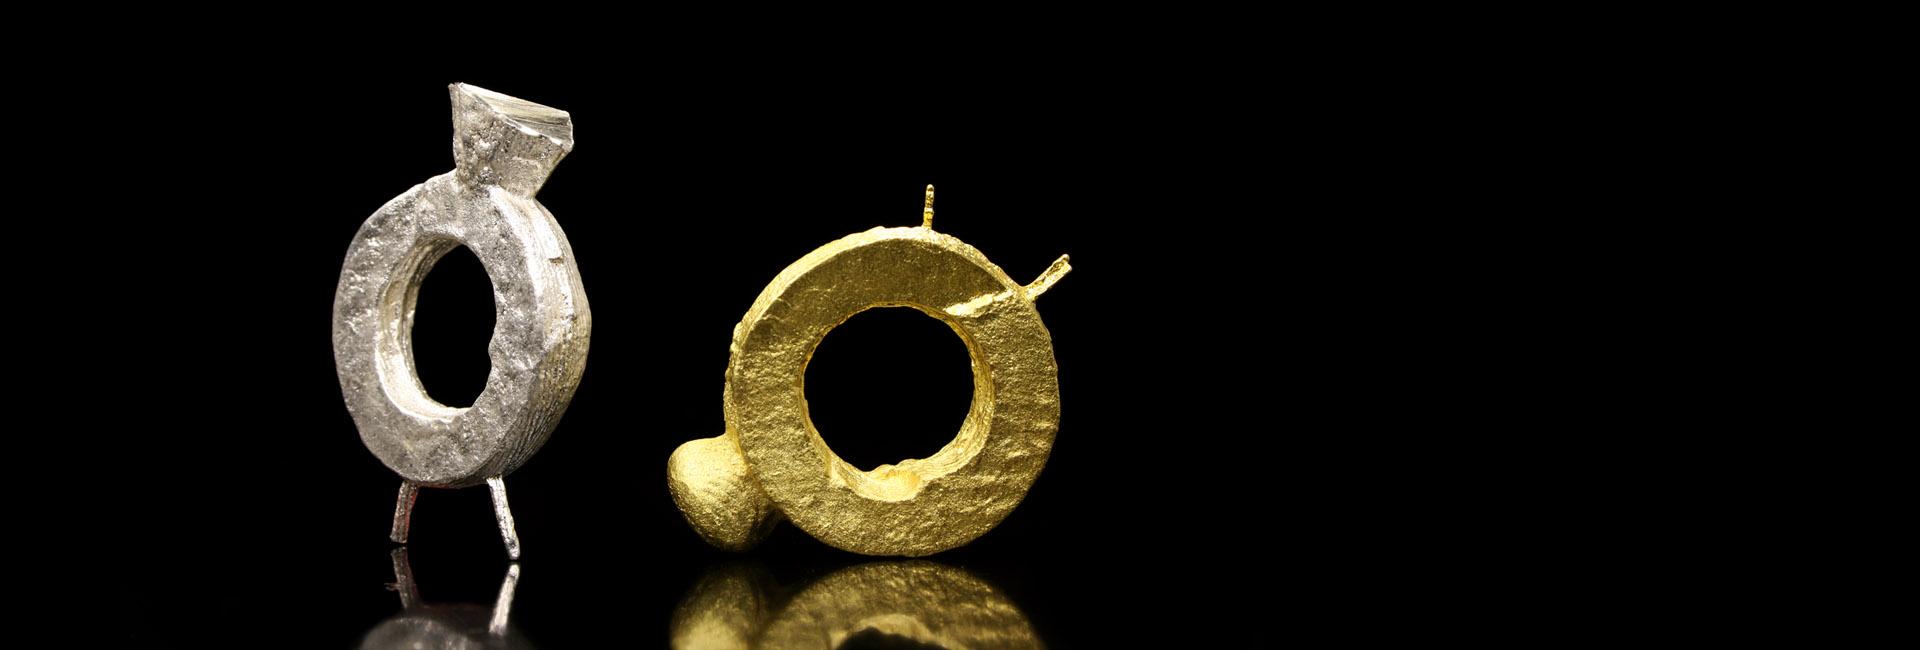 Alternatives gallery - Adrea Bloomard - Contemporary jewellery